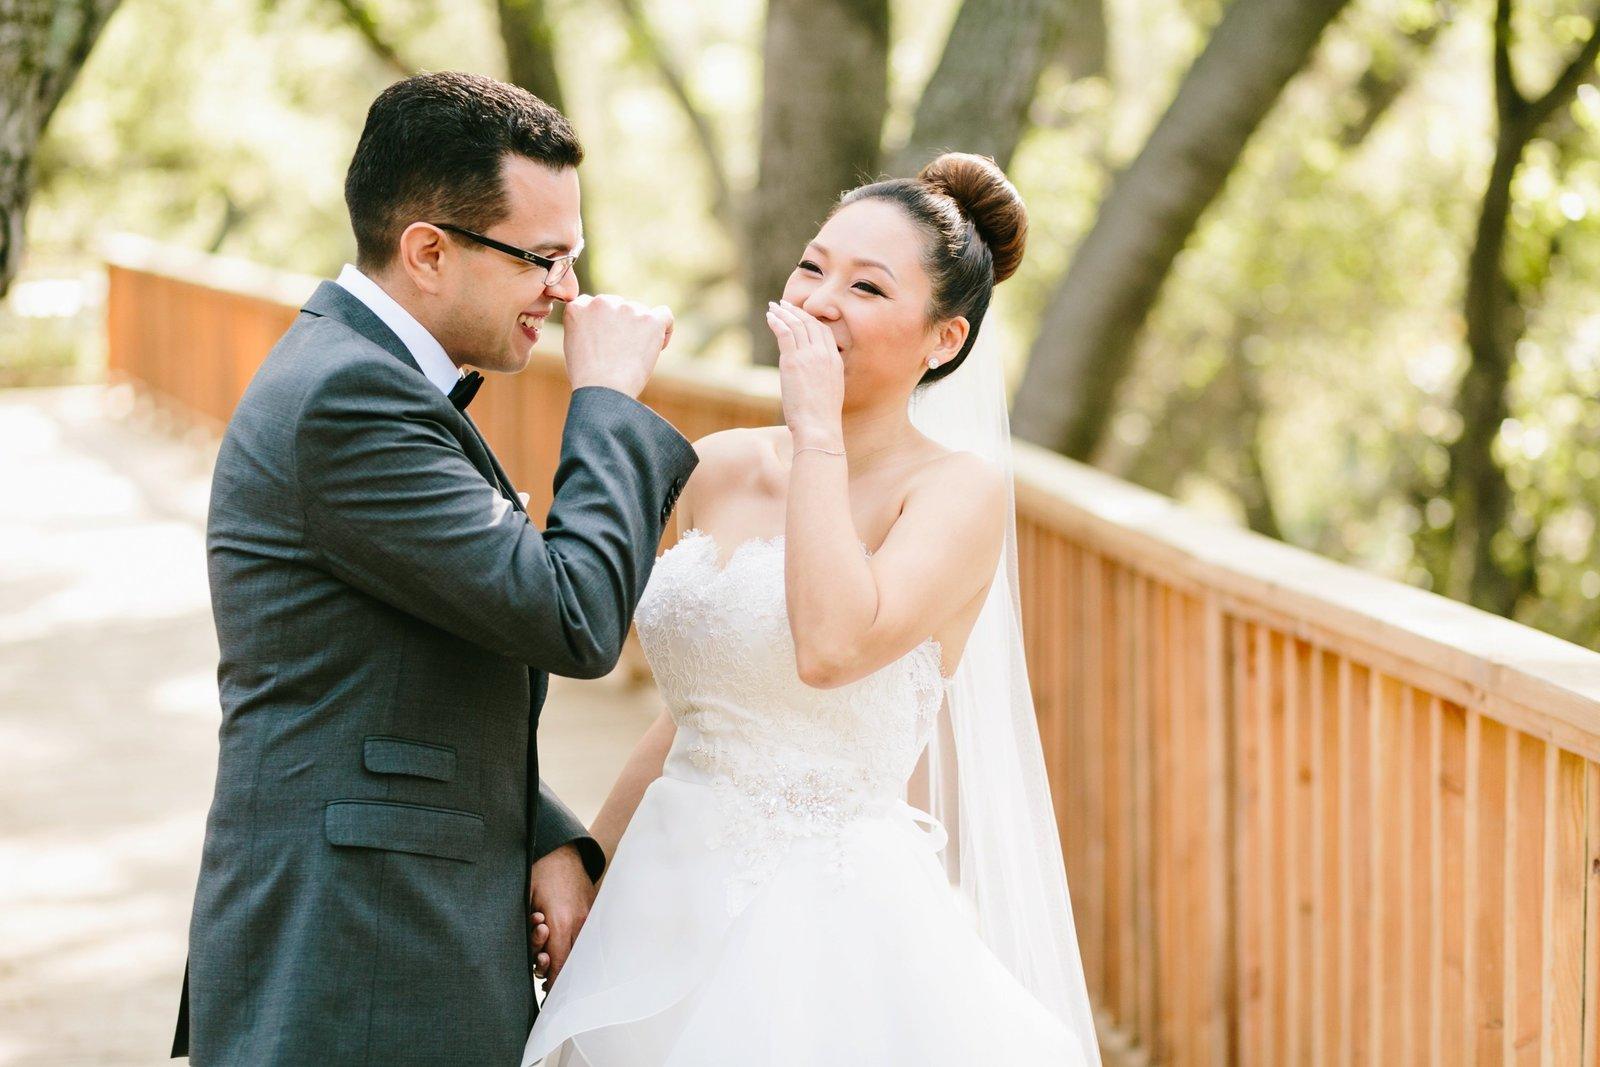 Wedding Photos-Jodee Debes Photography-442